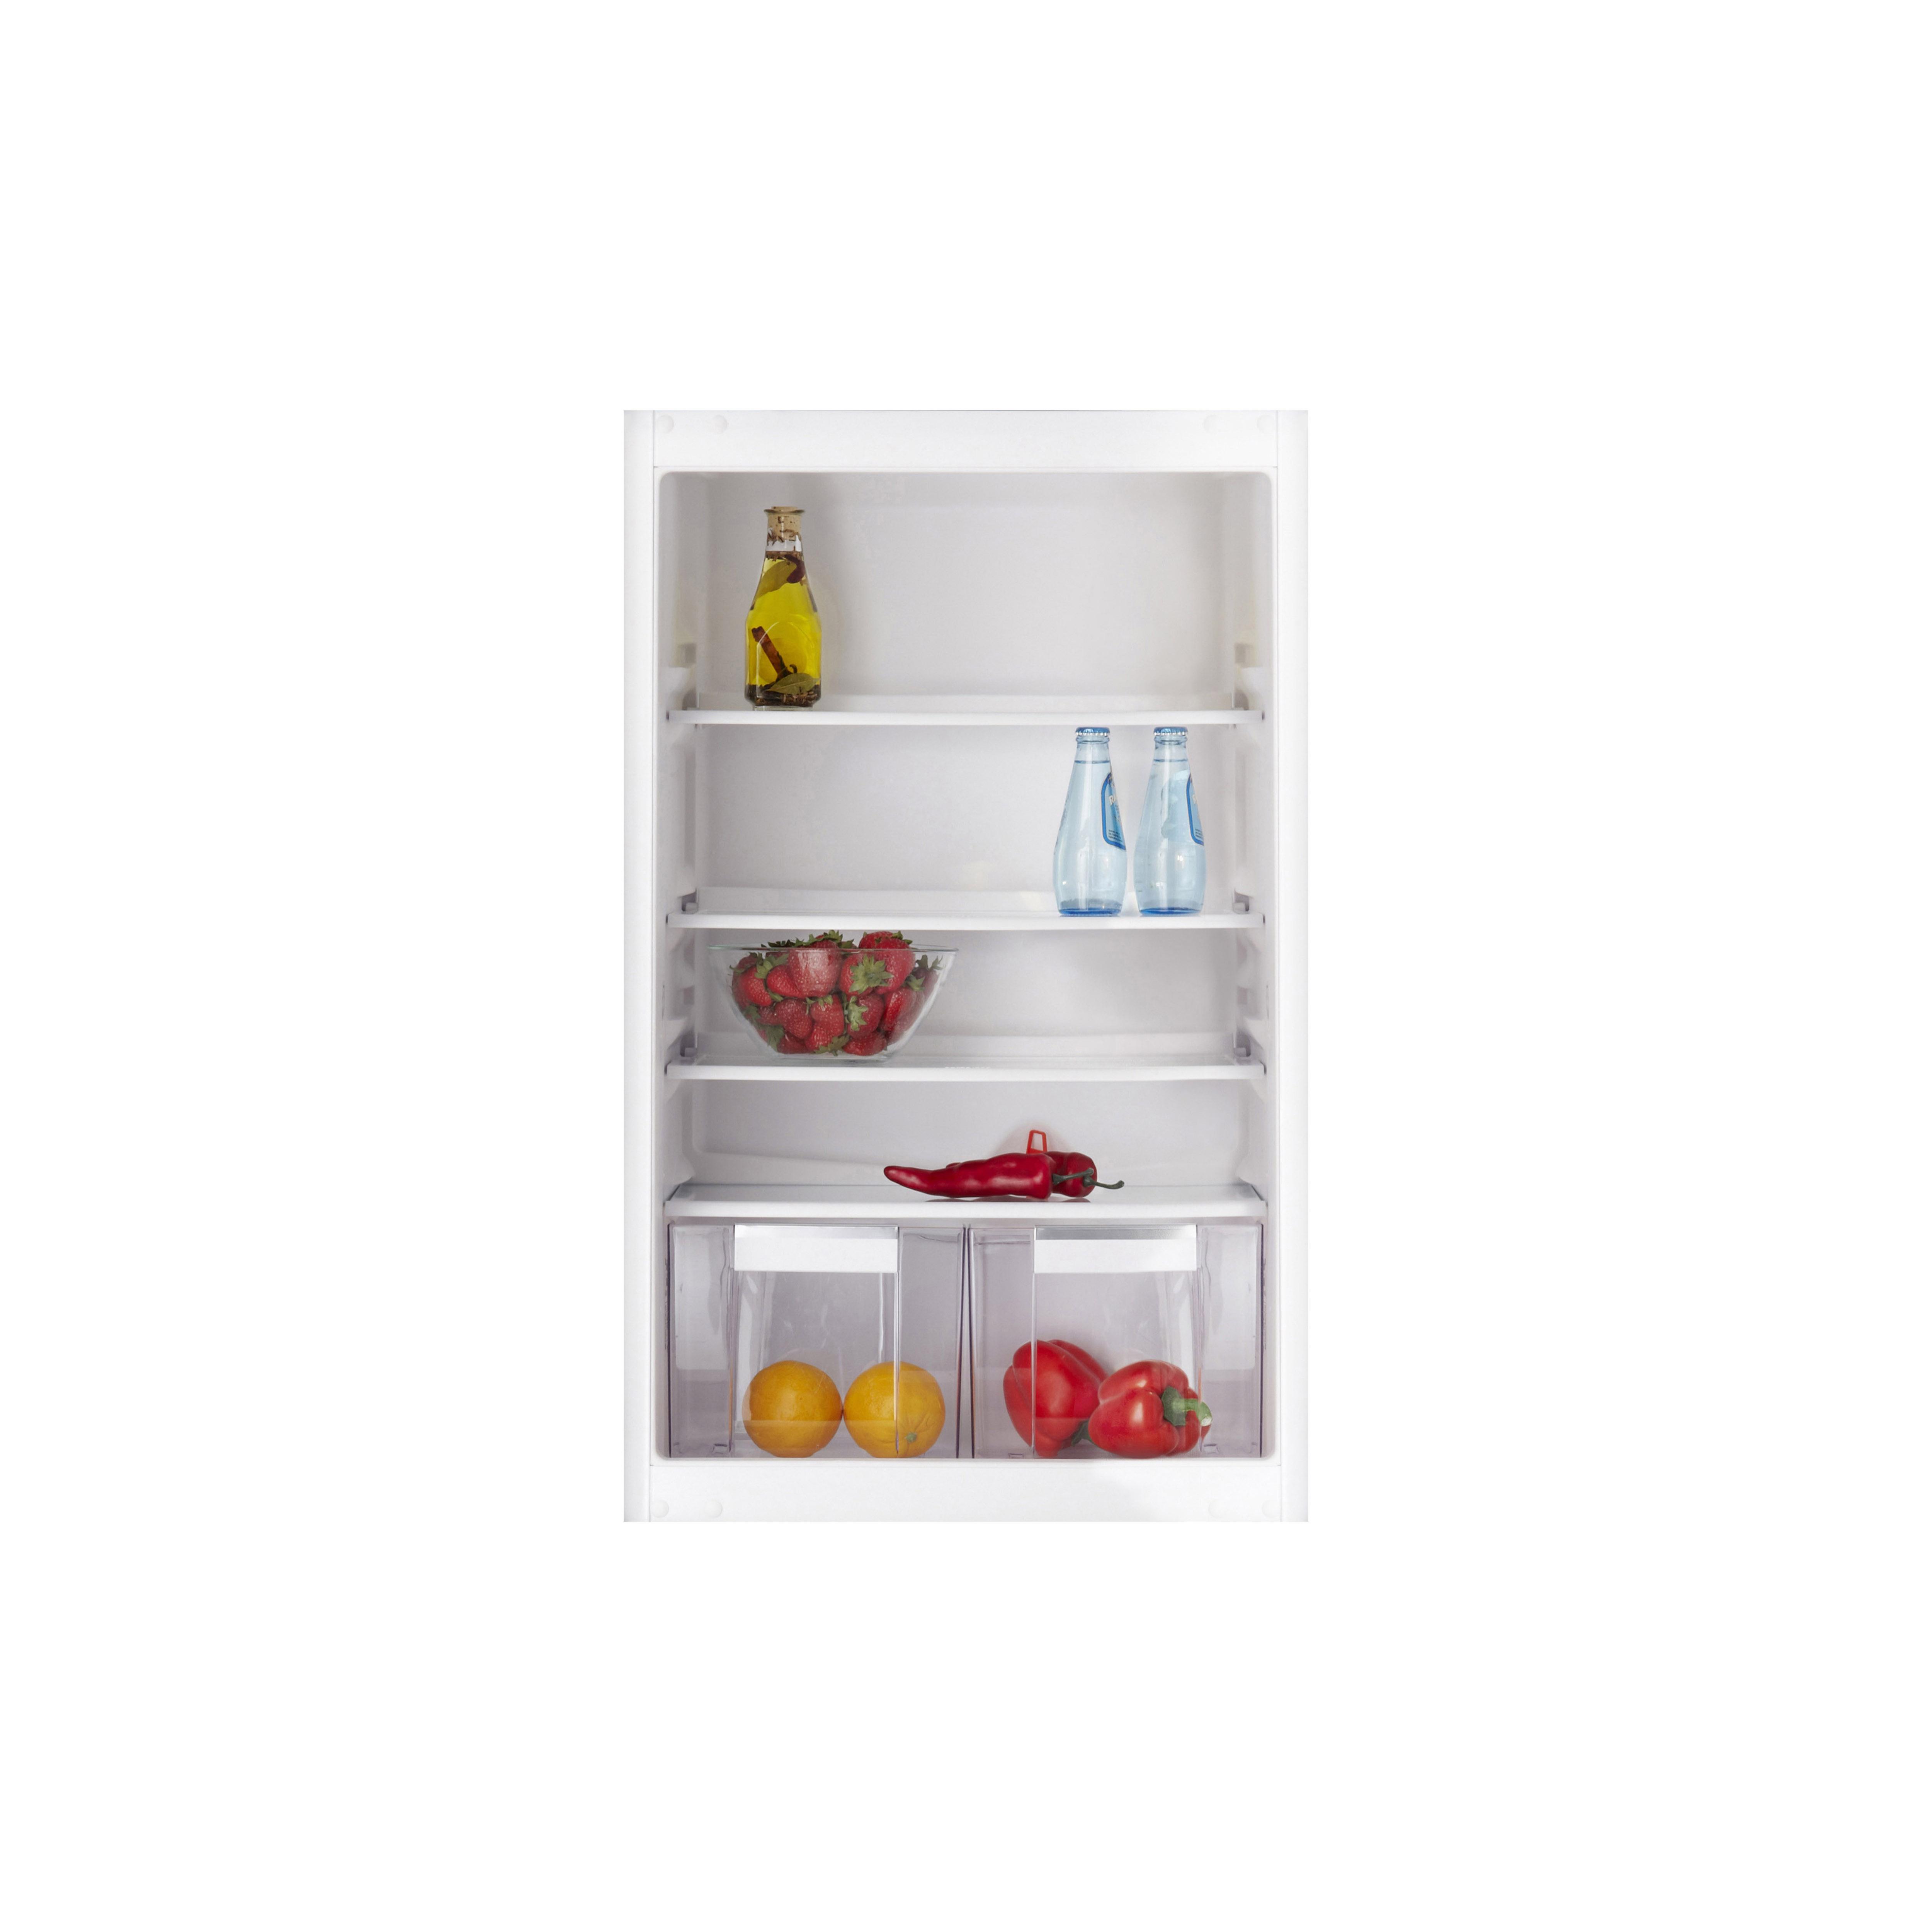 IKEA FROSTIGBC155